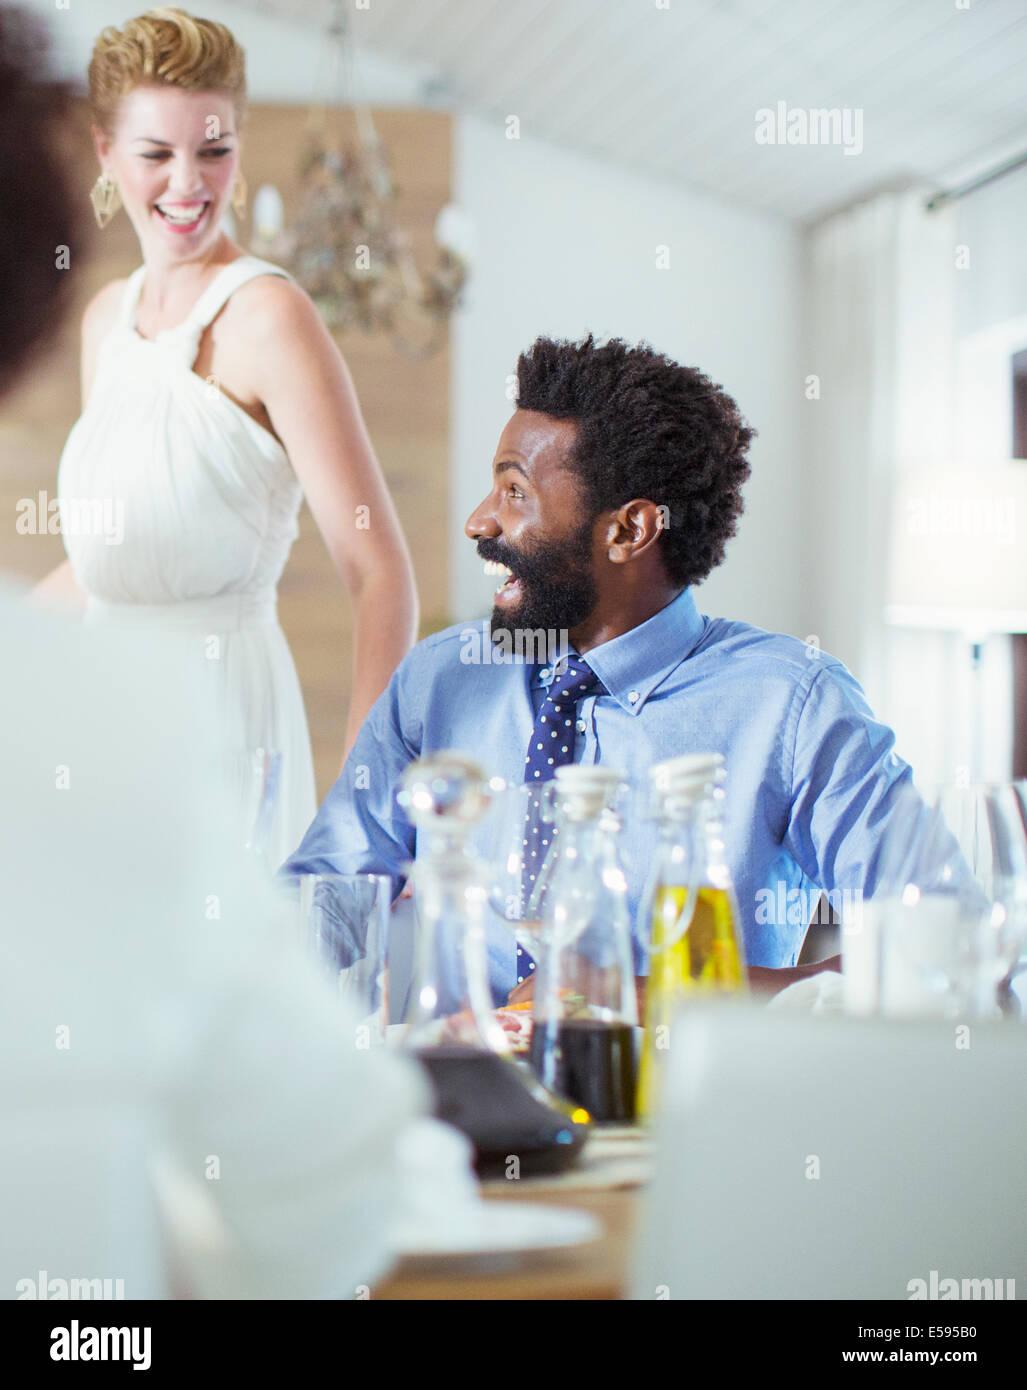 Menschen lachen bei Dinner-party Stockbild